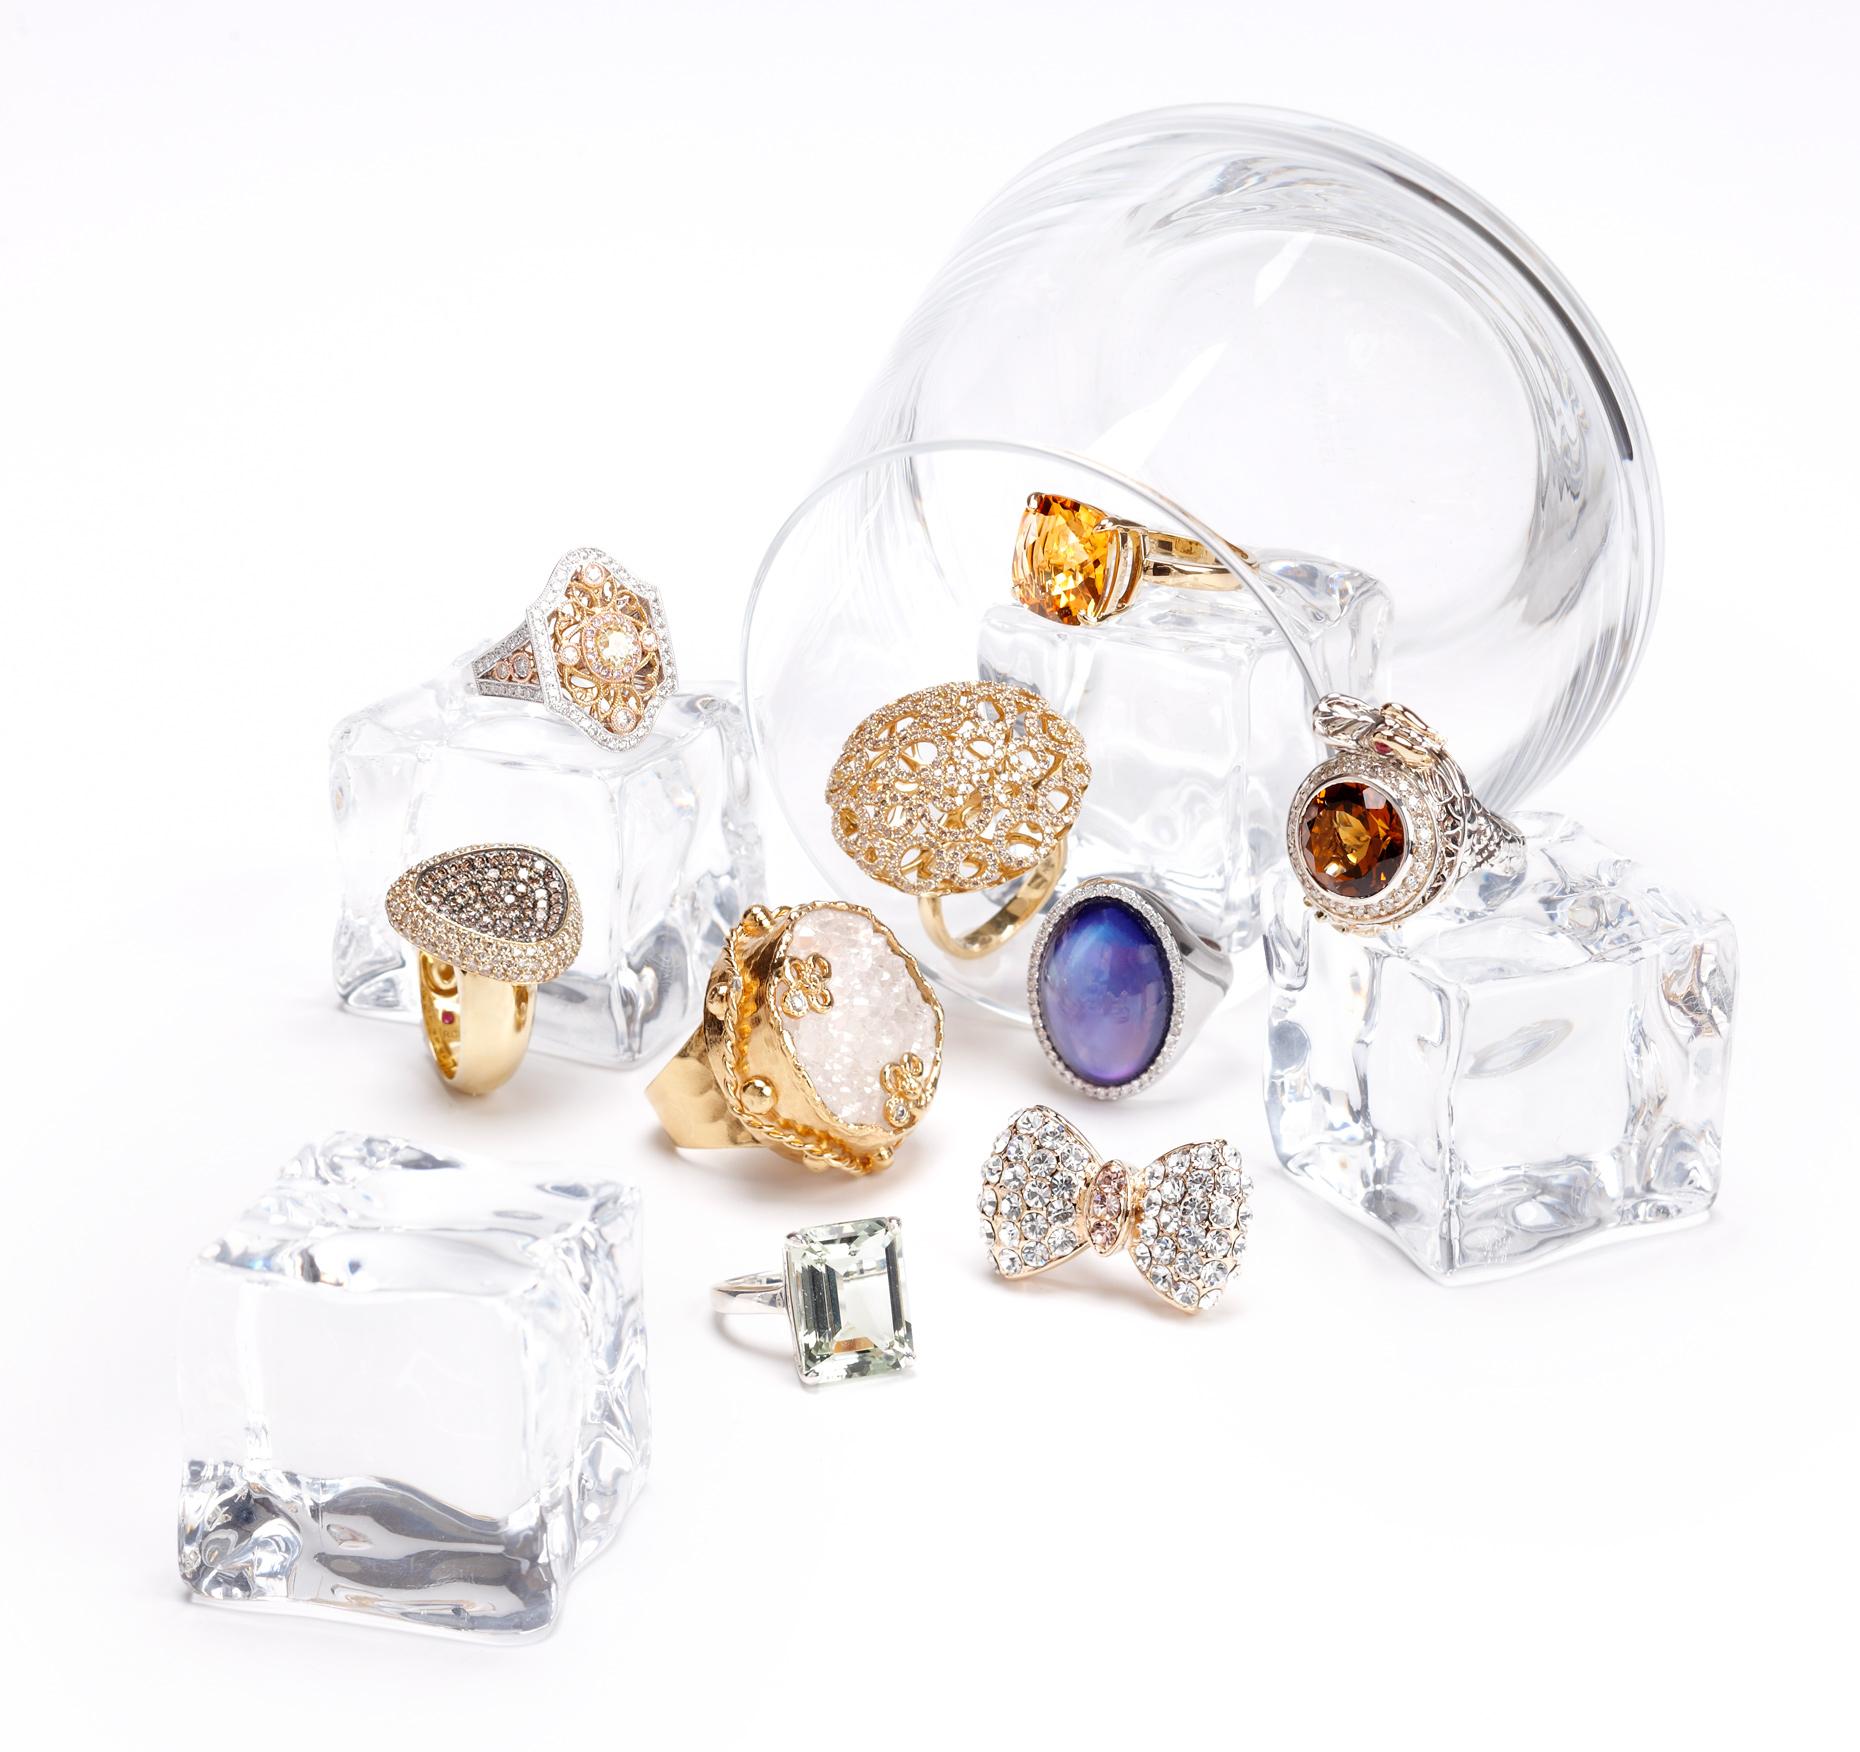 Product photography Jewelry Derek Israelsen Rings Bowtie